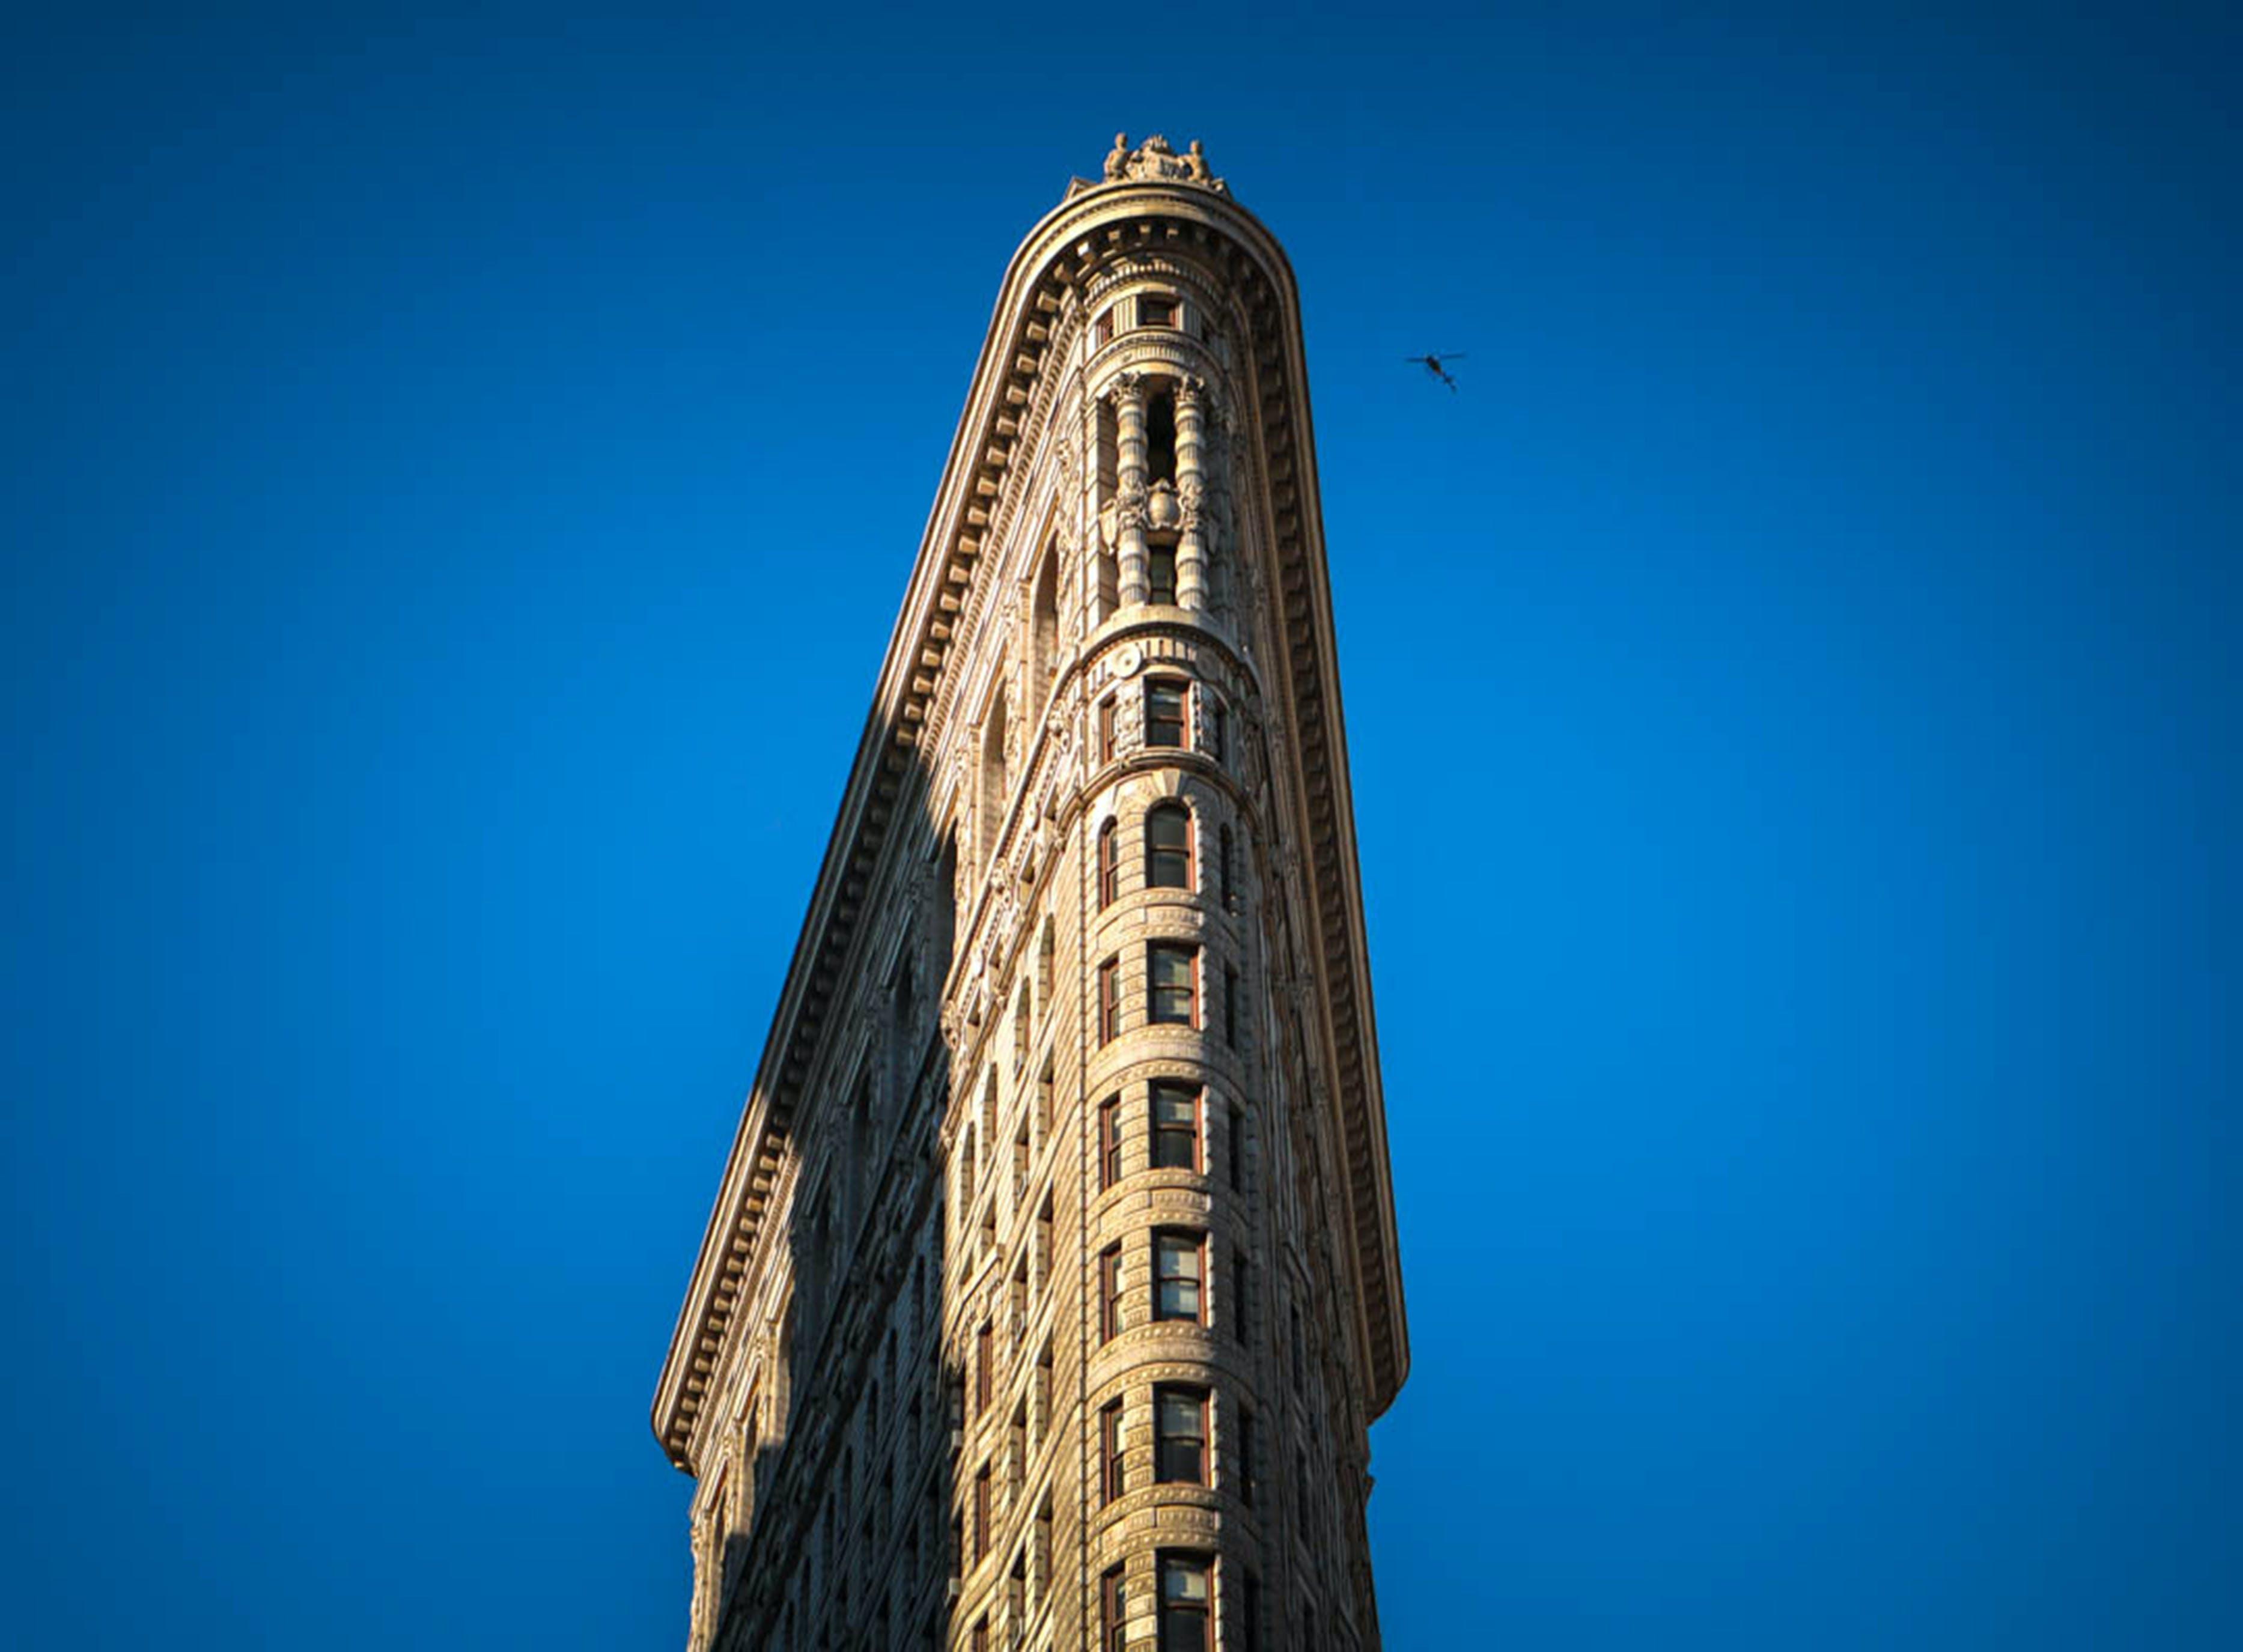 Free stock photo of #building, #flatiron, #iconic, #landmark